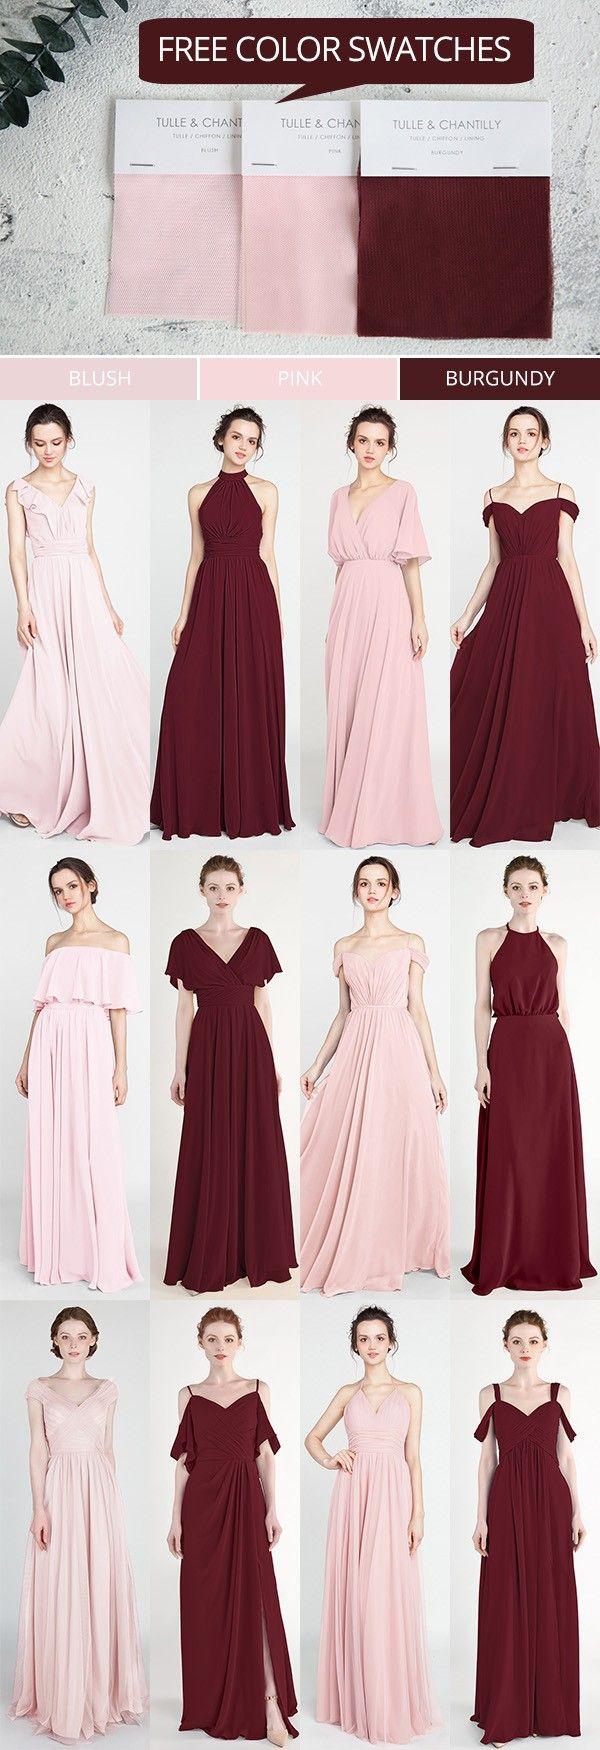 pink and burgundy bridesamid dresses with free swatches #wedding #weddinginspiration #bridesmaids #bridesmaiddress #bridalparty #maidofhonor #weddingideas #weddingcolors #tulleandchantilly – Aderianna Manuel